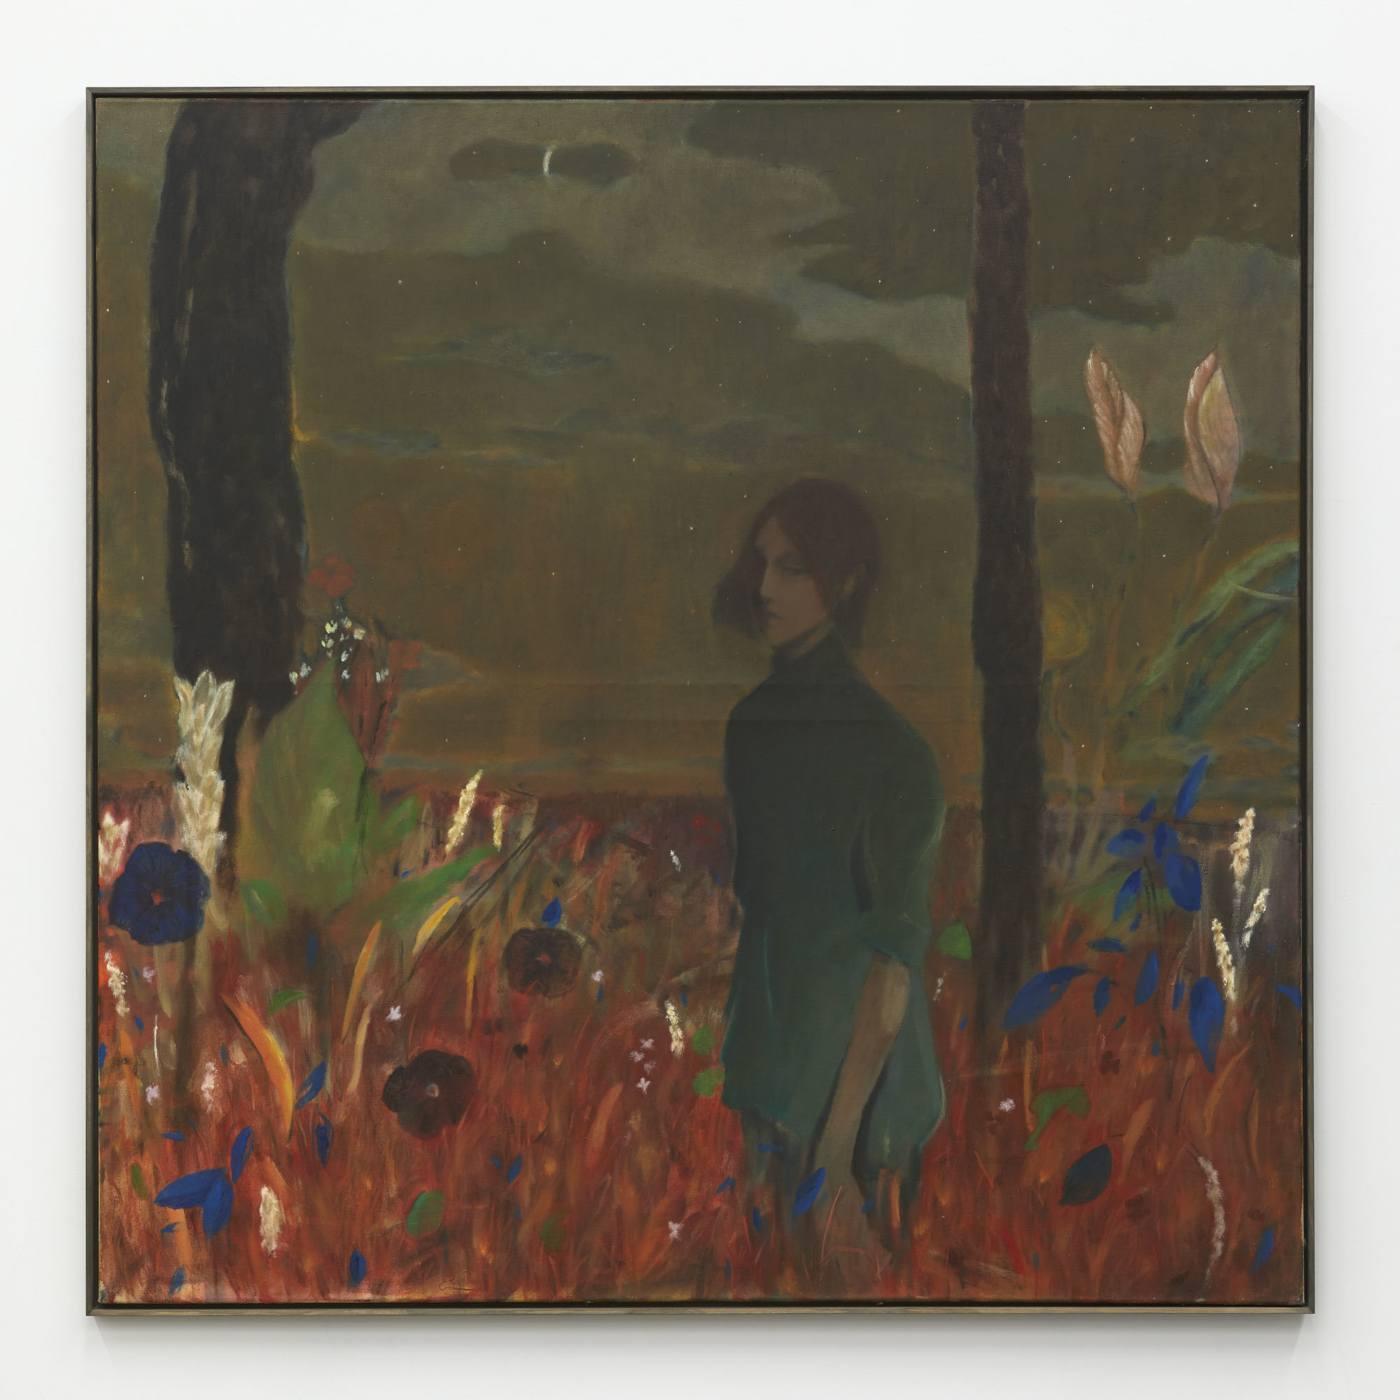 Ernst Yohji Jaeger,/Untitled 3/, 2020, oil on canvas, 125.73 × 125.73 cm